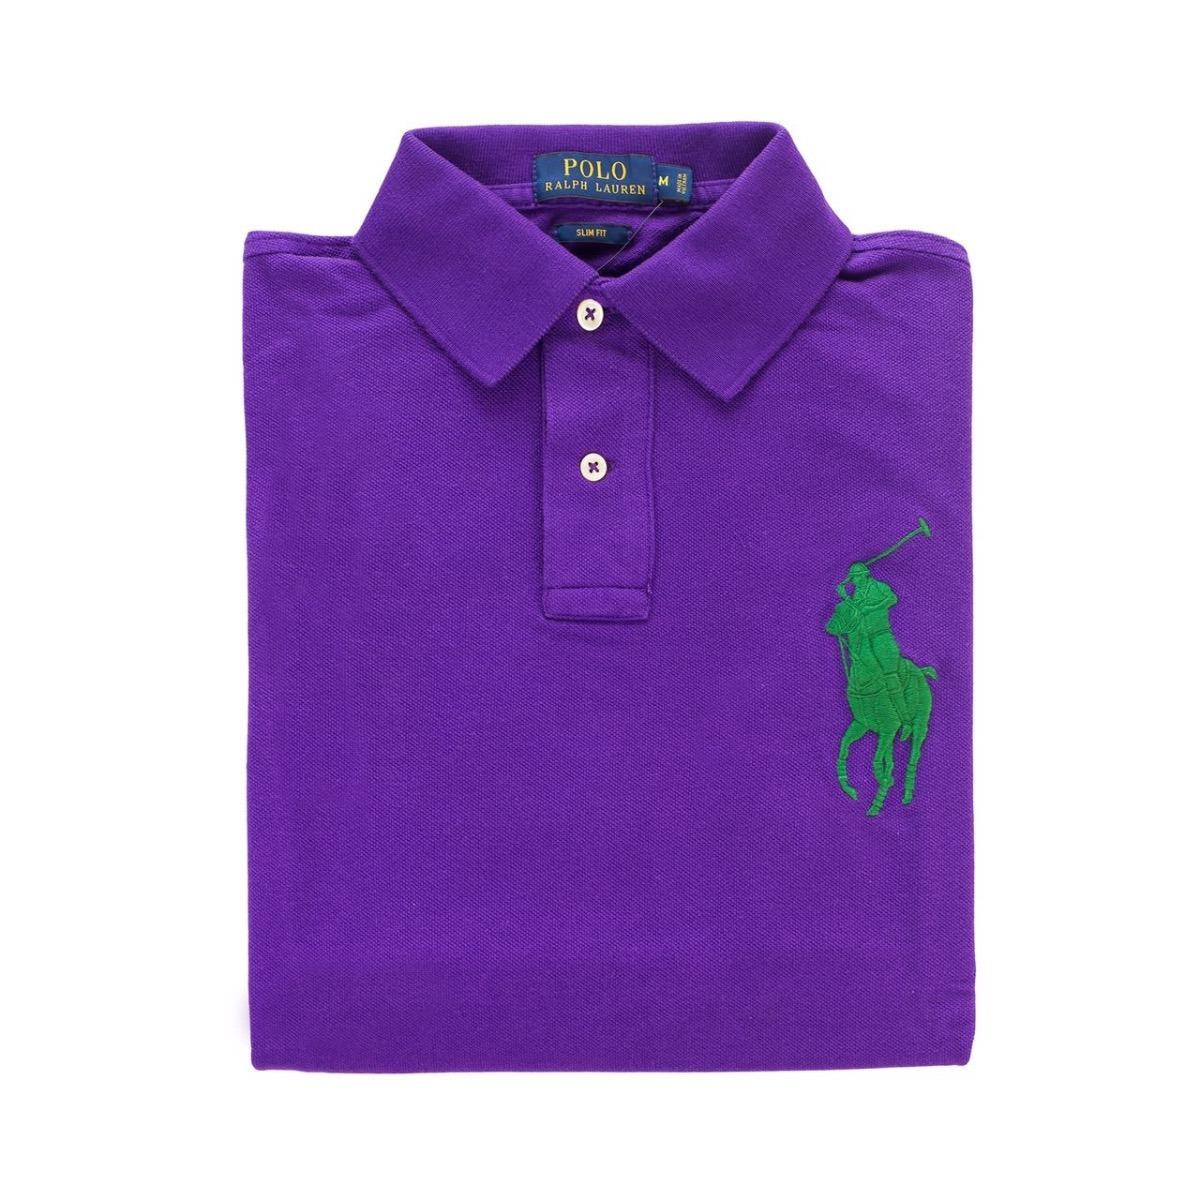 fcf8f246d5f99 Camisa Polo Ralph Lauren Masculina Big Poney Importada Usa - R  279 ...